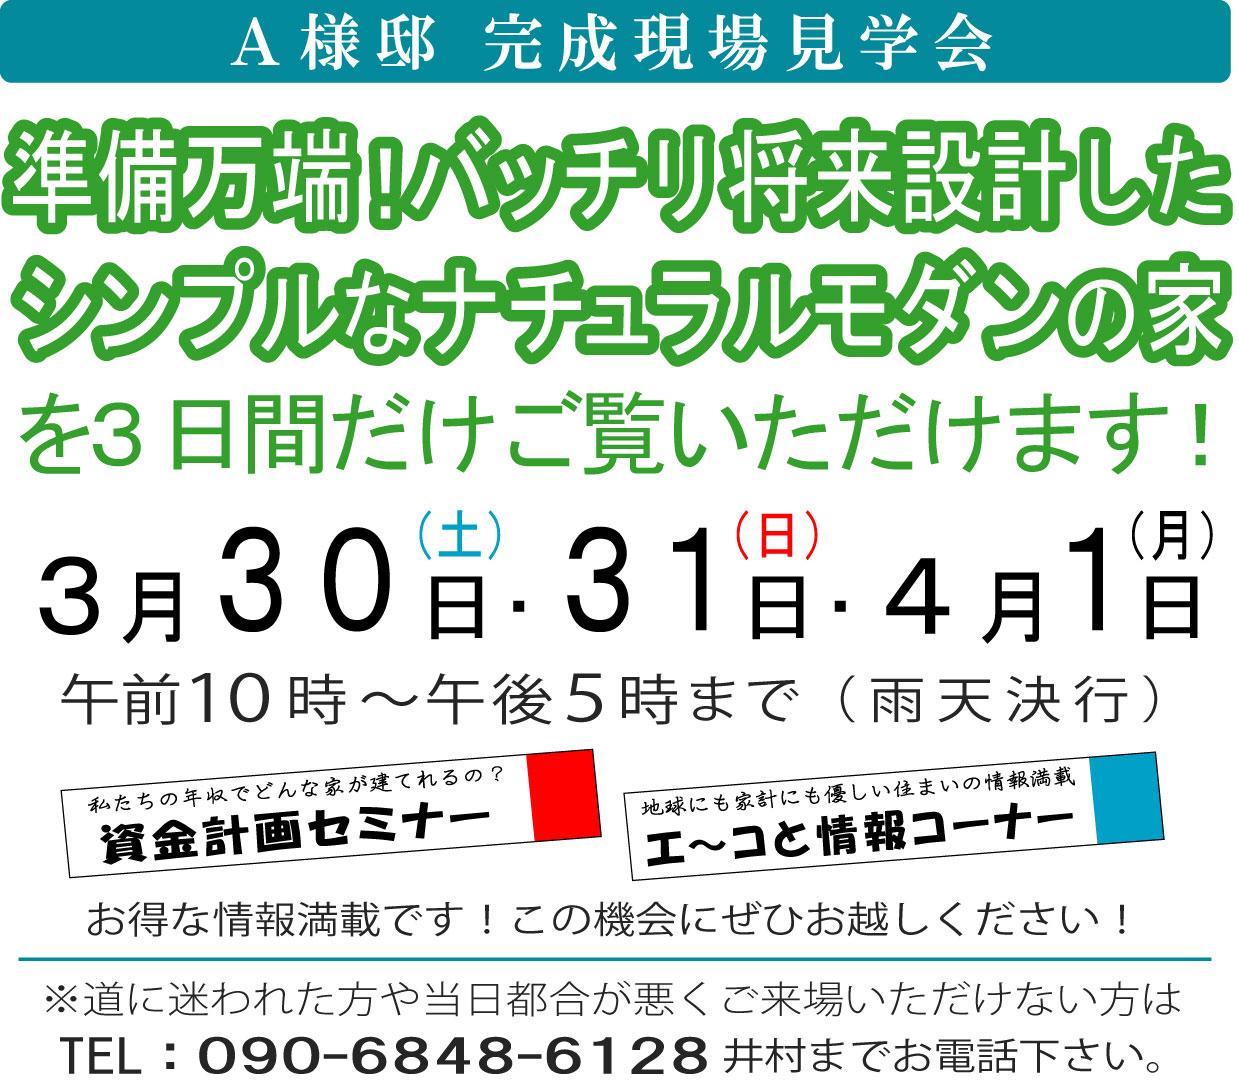 KuraSi-natu-sin70-04.jpg